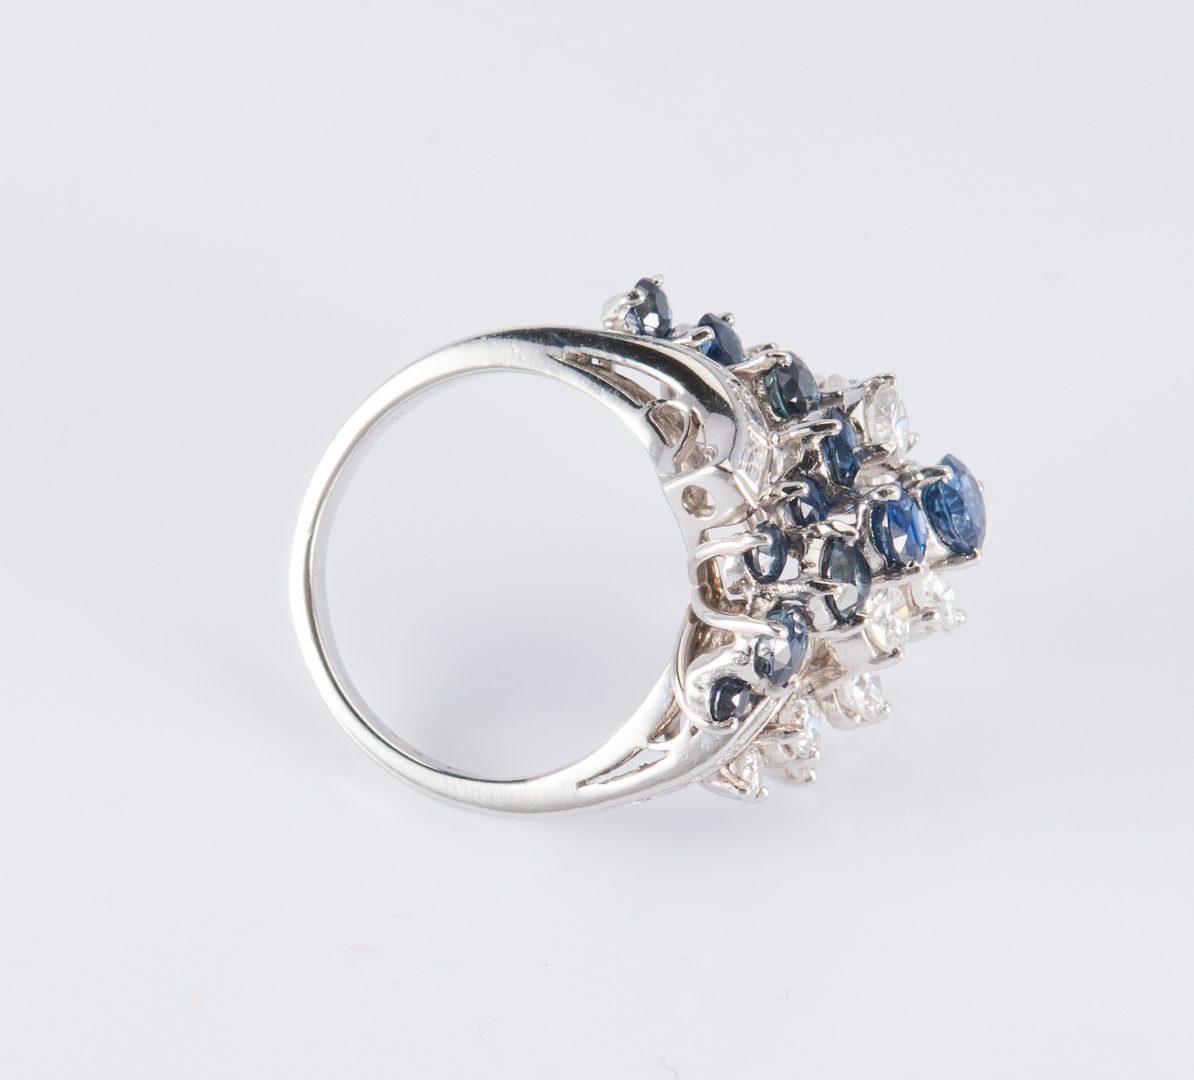 Lot 316: Platinum, Diamond, Sapphire Ring